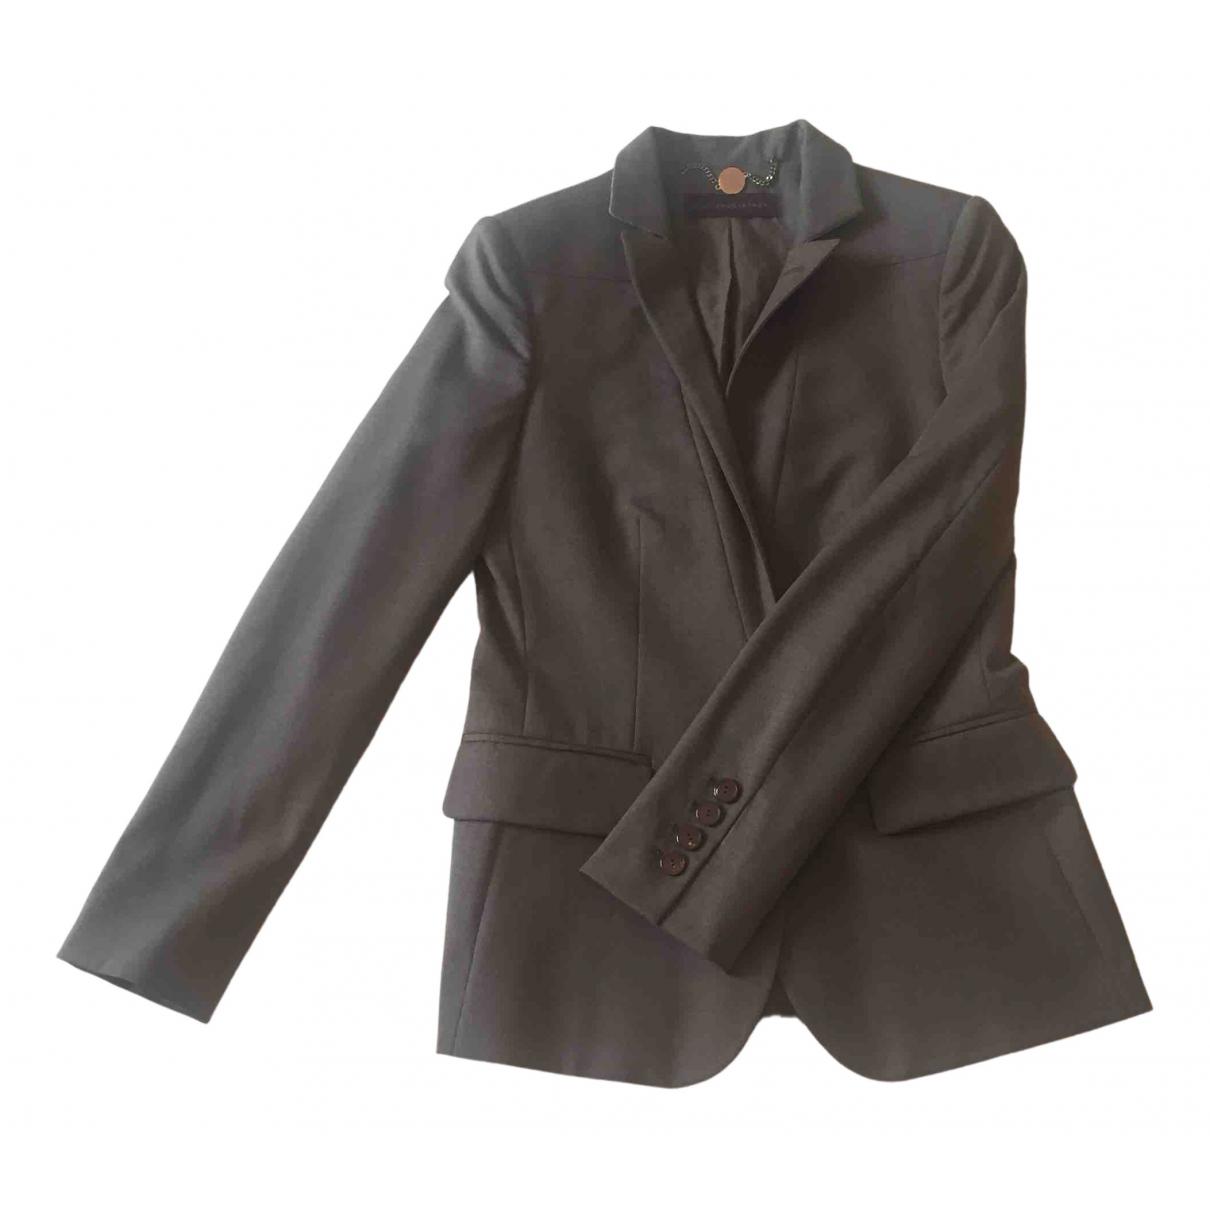 Stella Mccartney N Brown Wool jacket for Women 36 FR